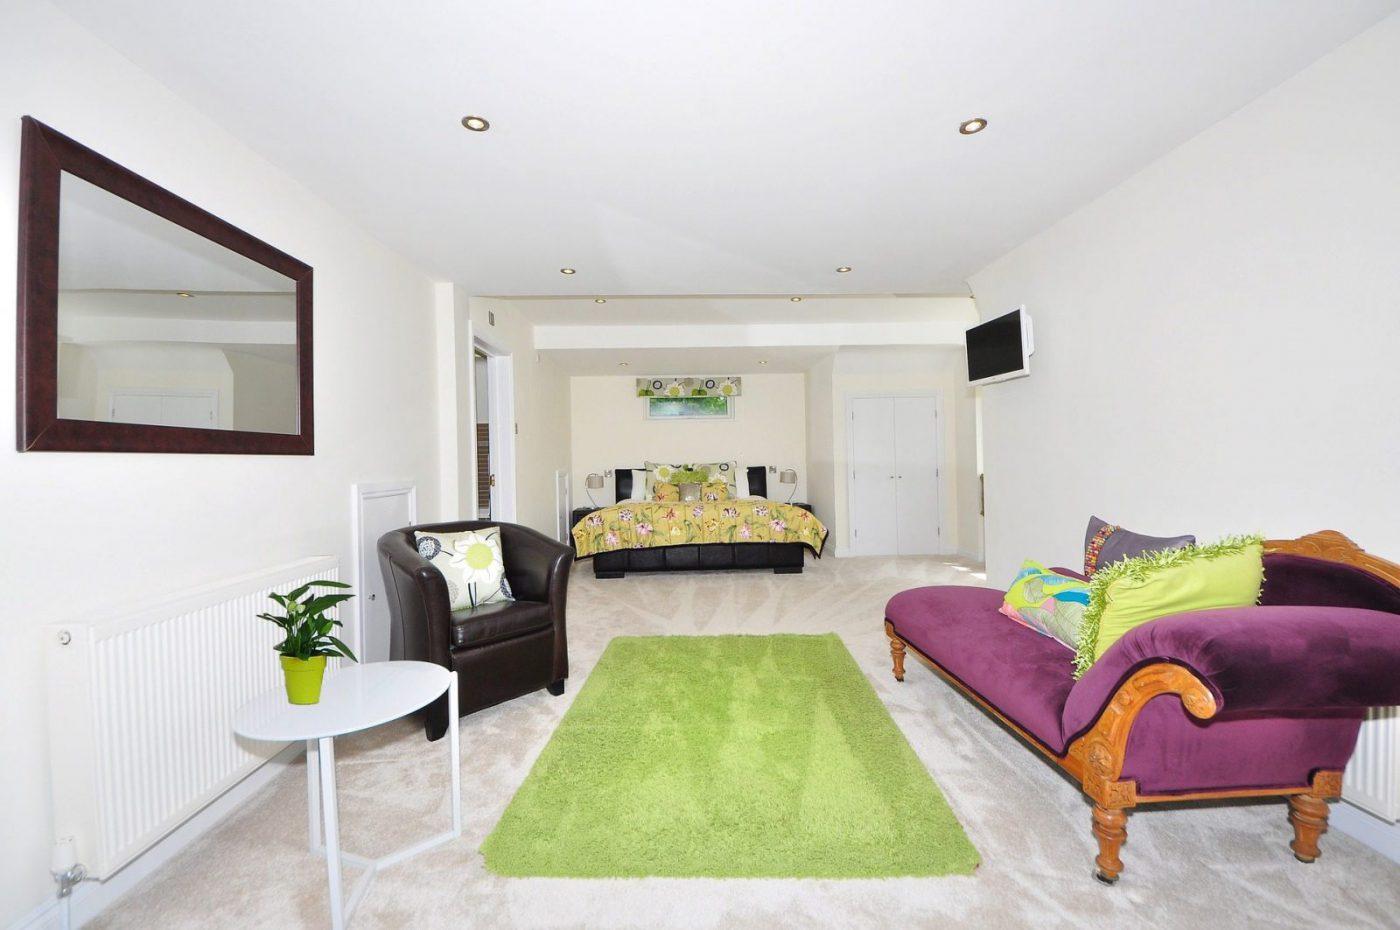 4 Bedrooms, Semi-Detached House